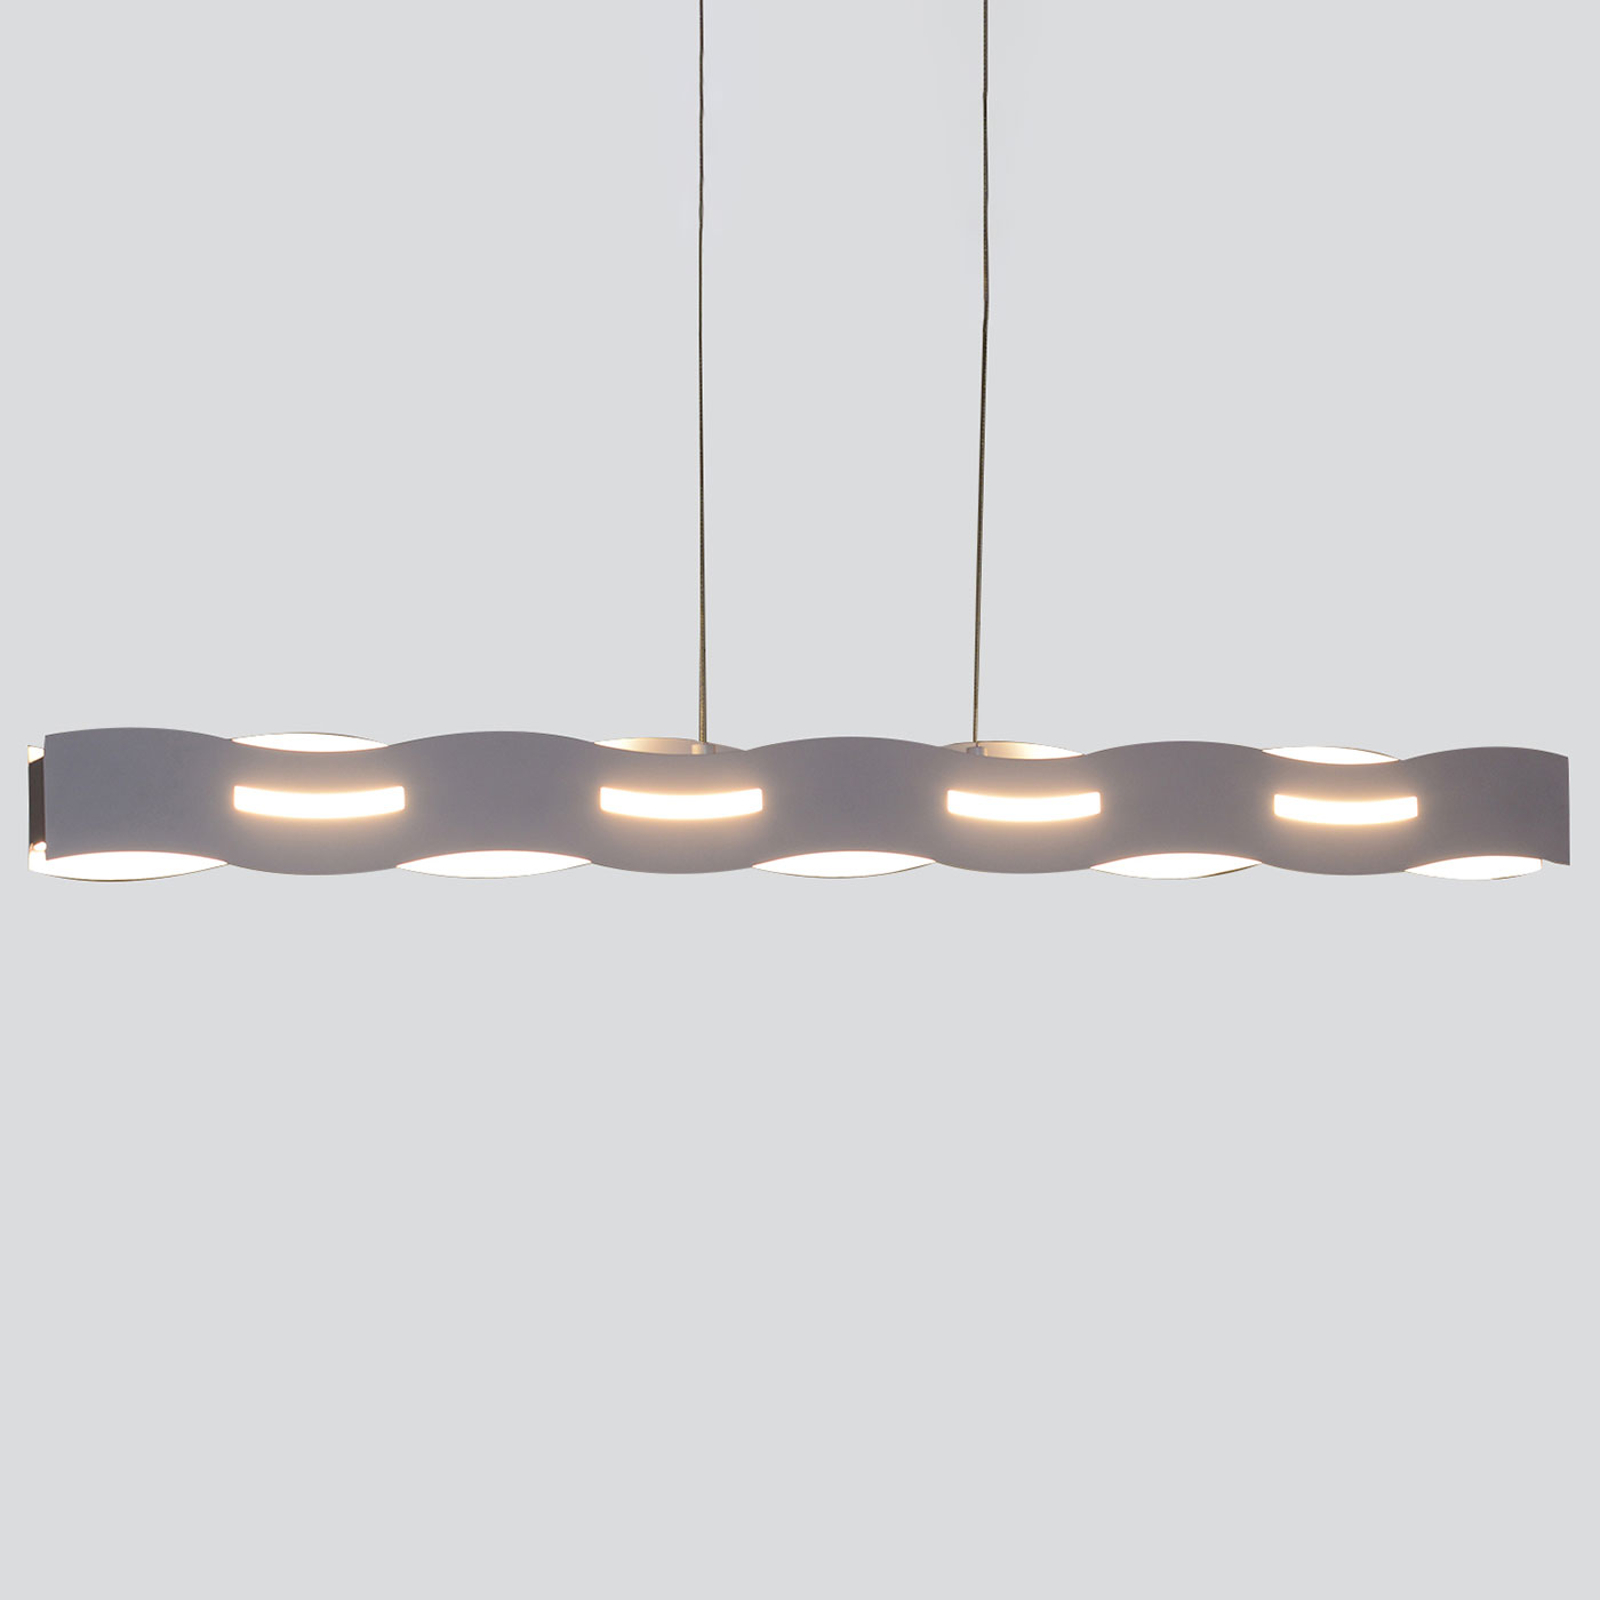 Lampa wisząca LED Wave nikiel